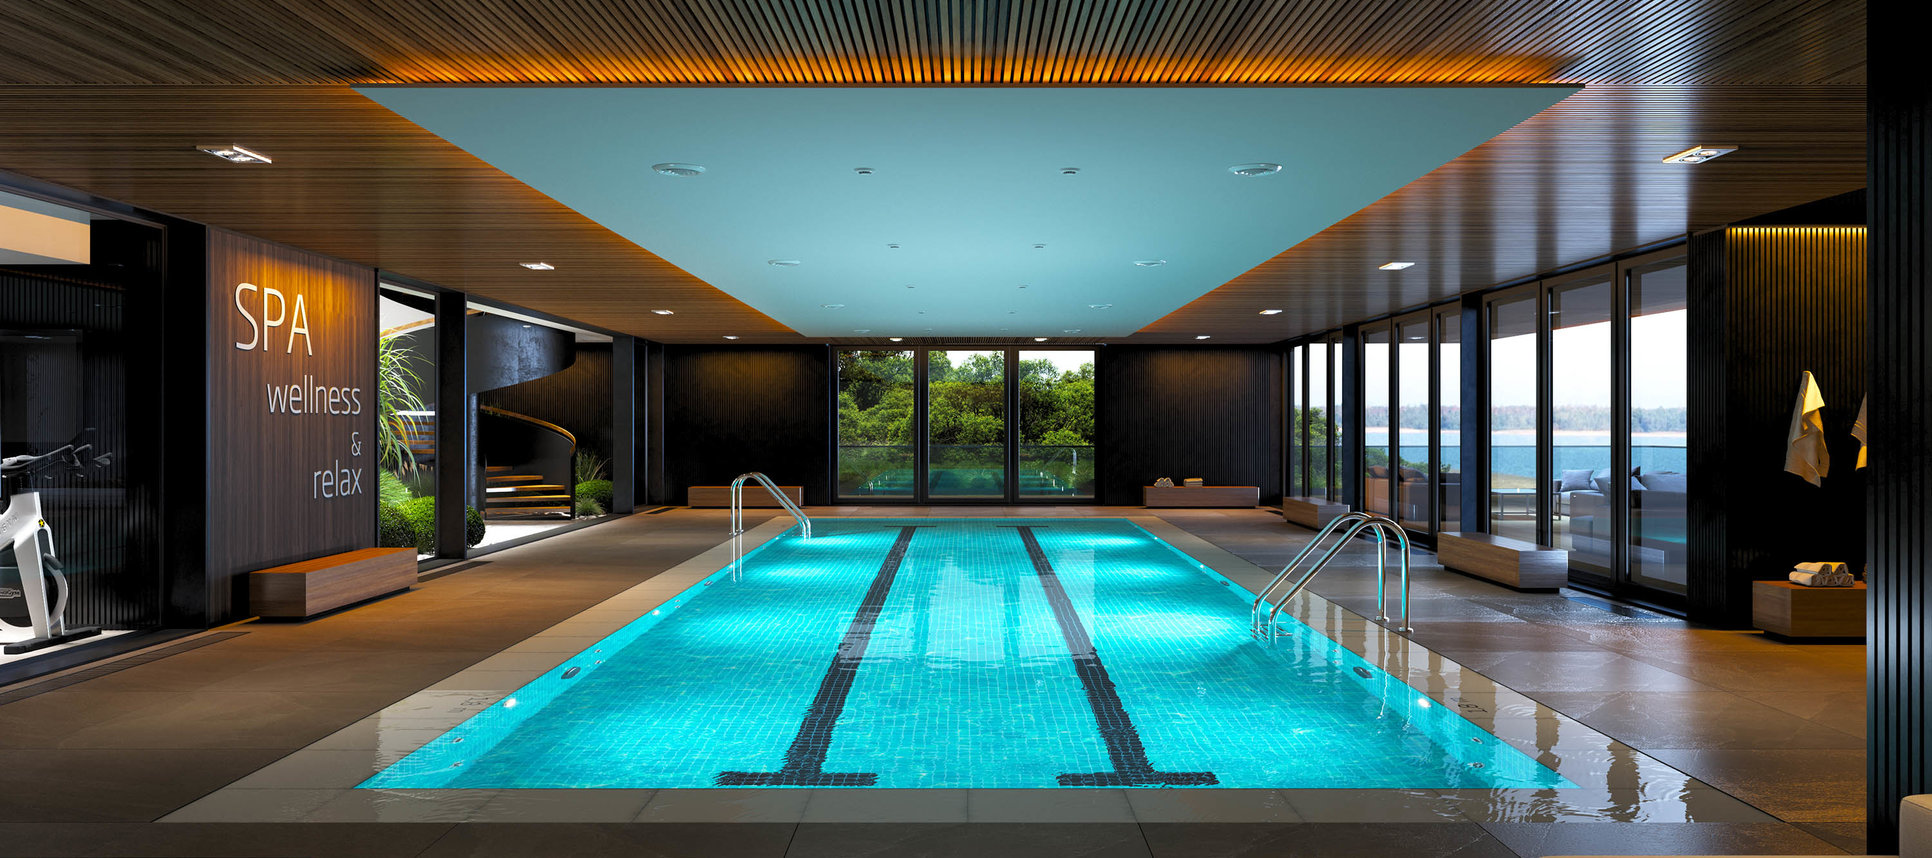 LUXURY HOTEL - Spa, Wllness & Relax